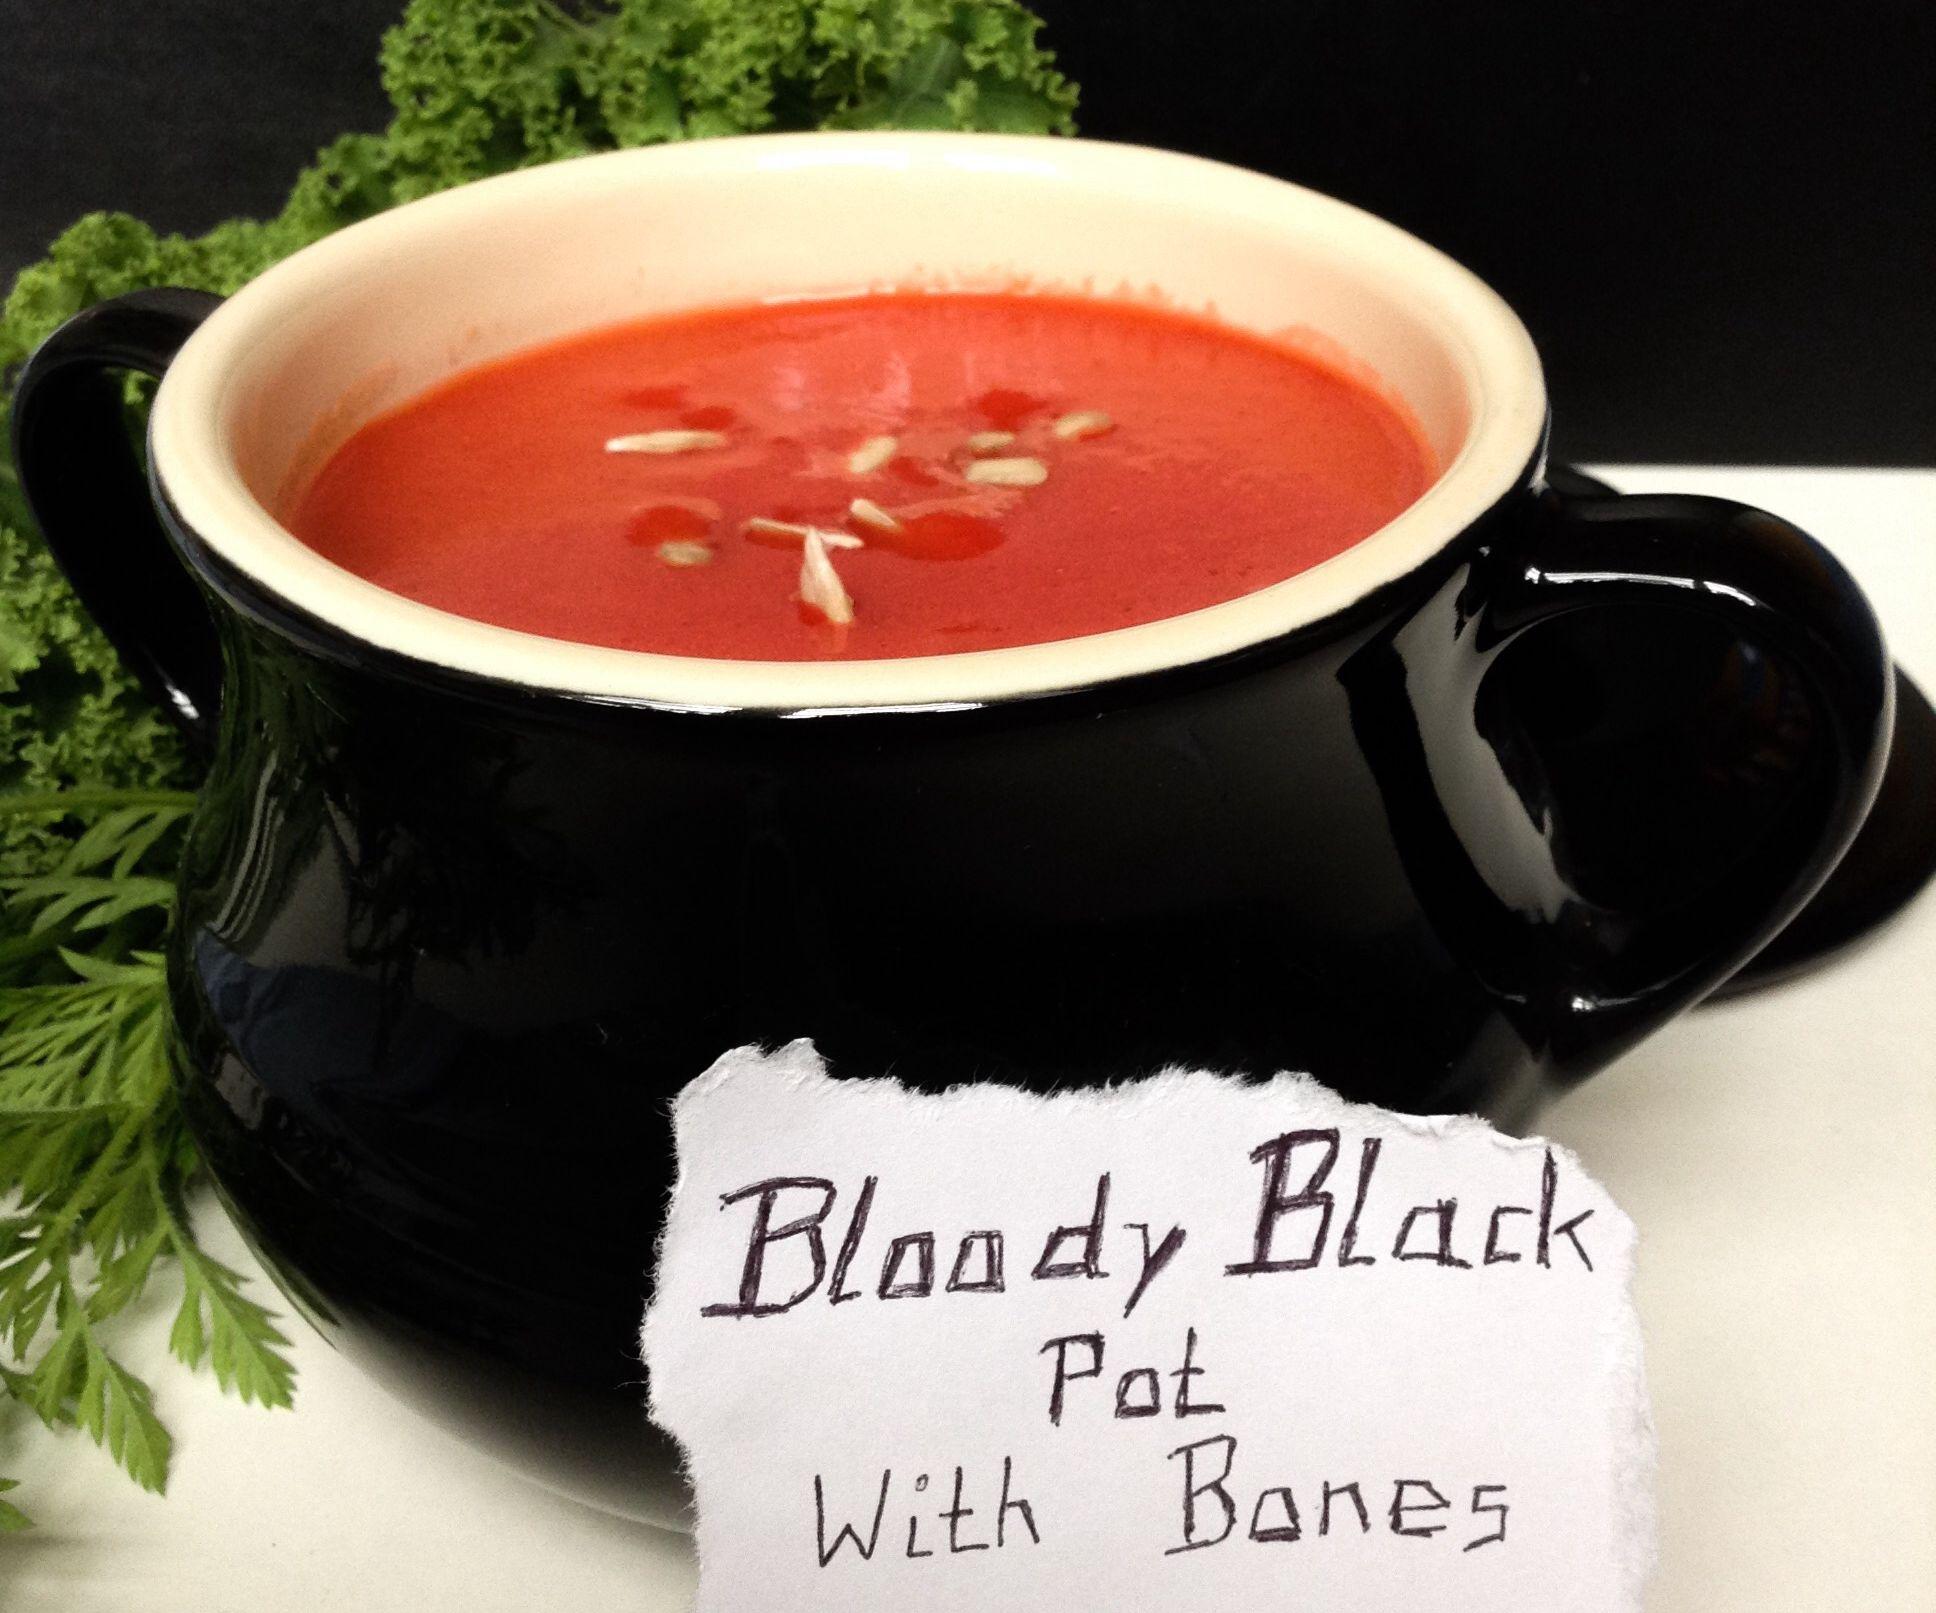 Bloody Black Pot with Bones